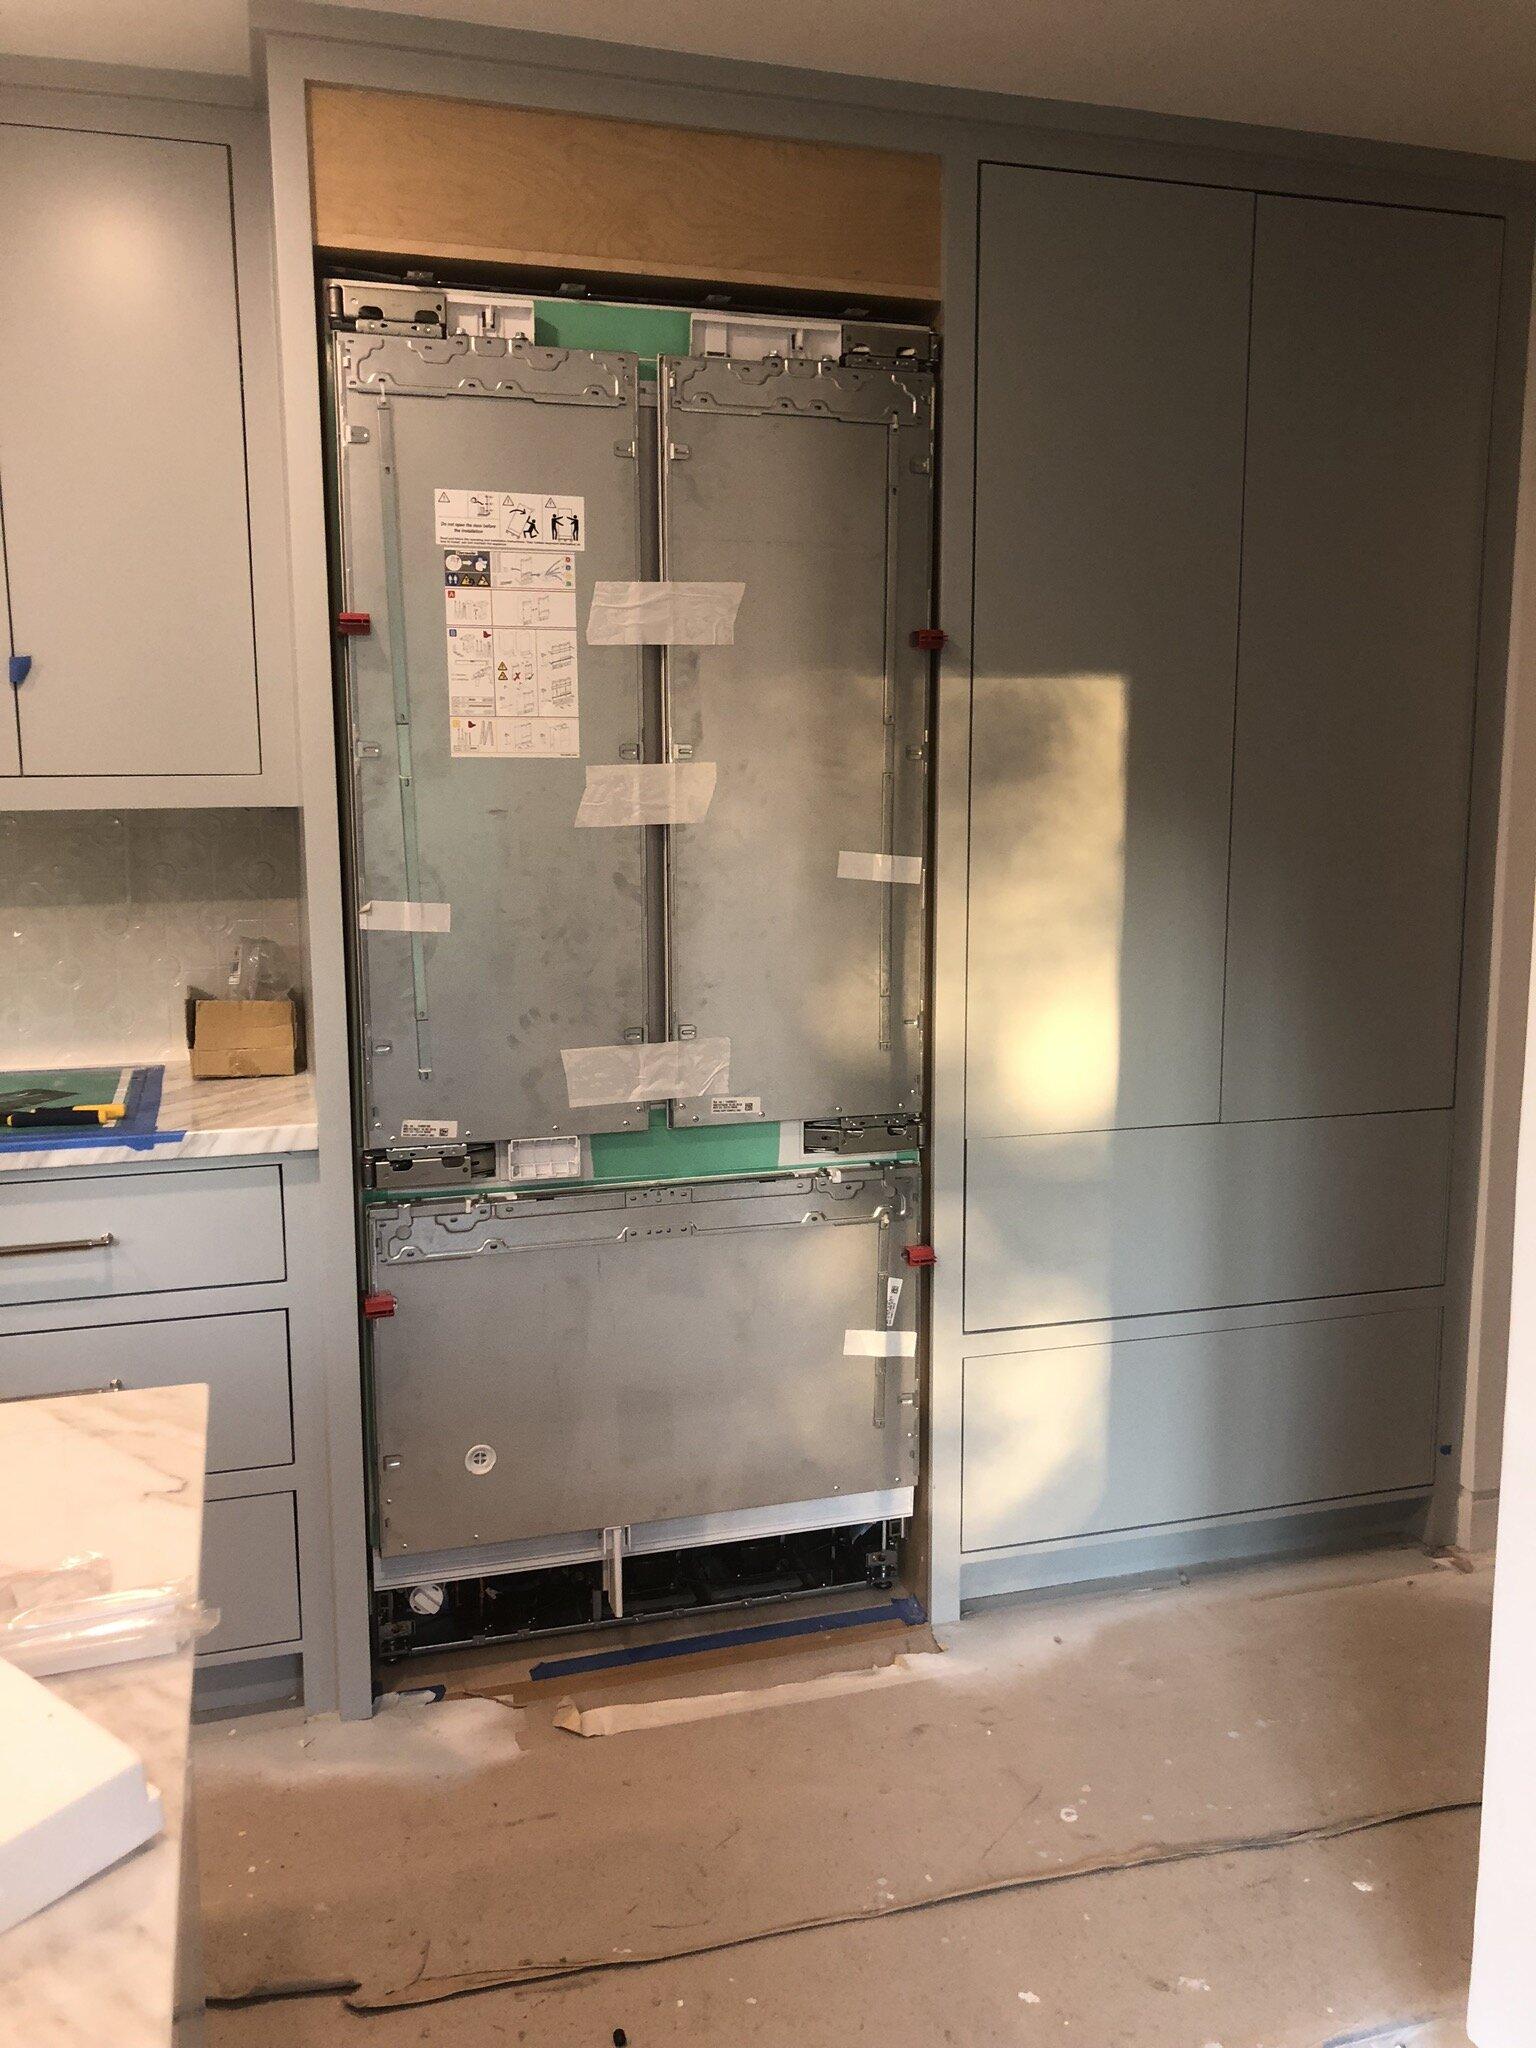 Yes, that's a fridge